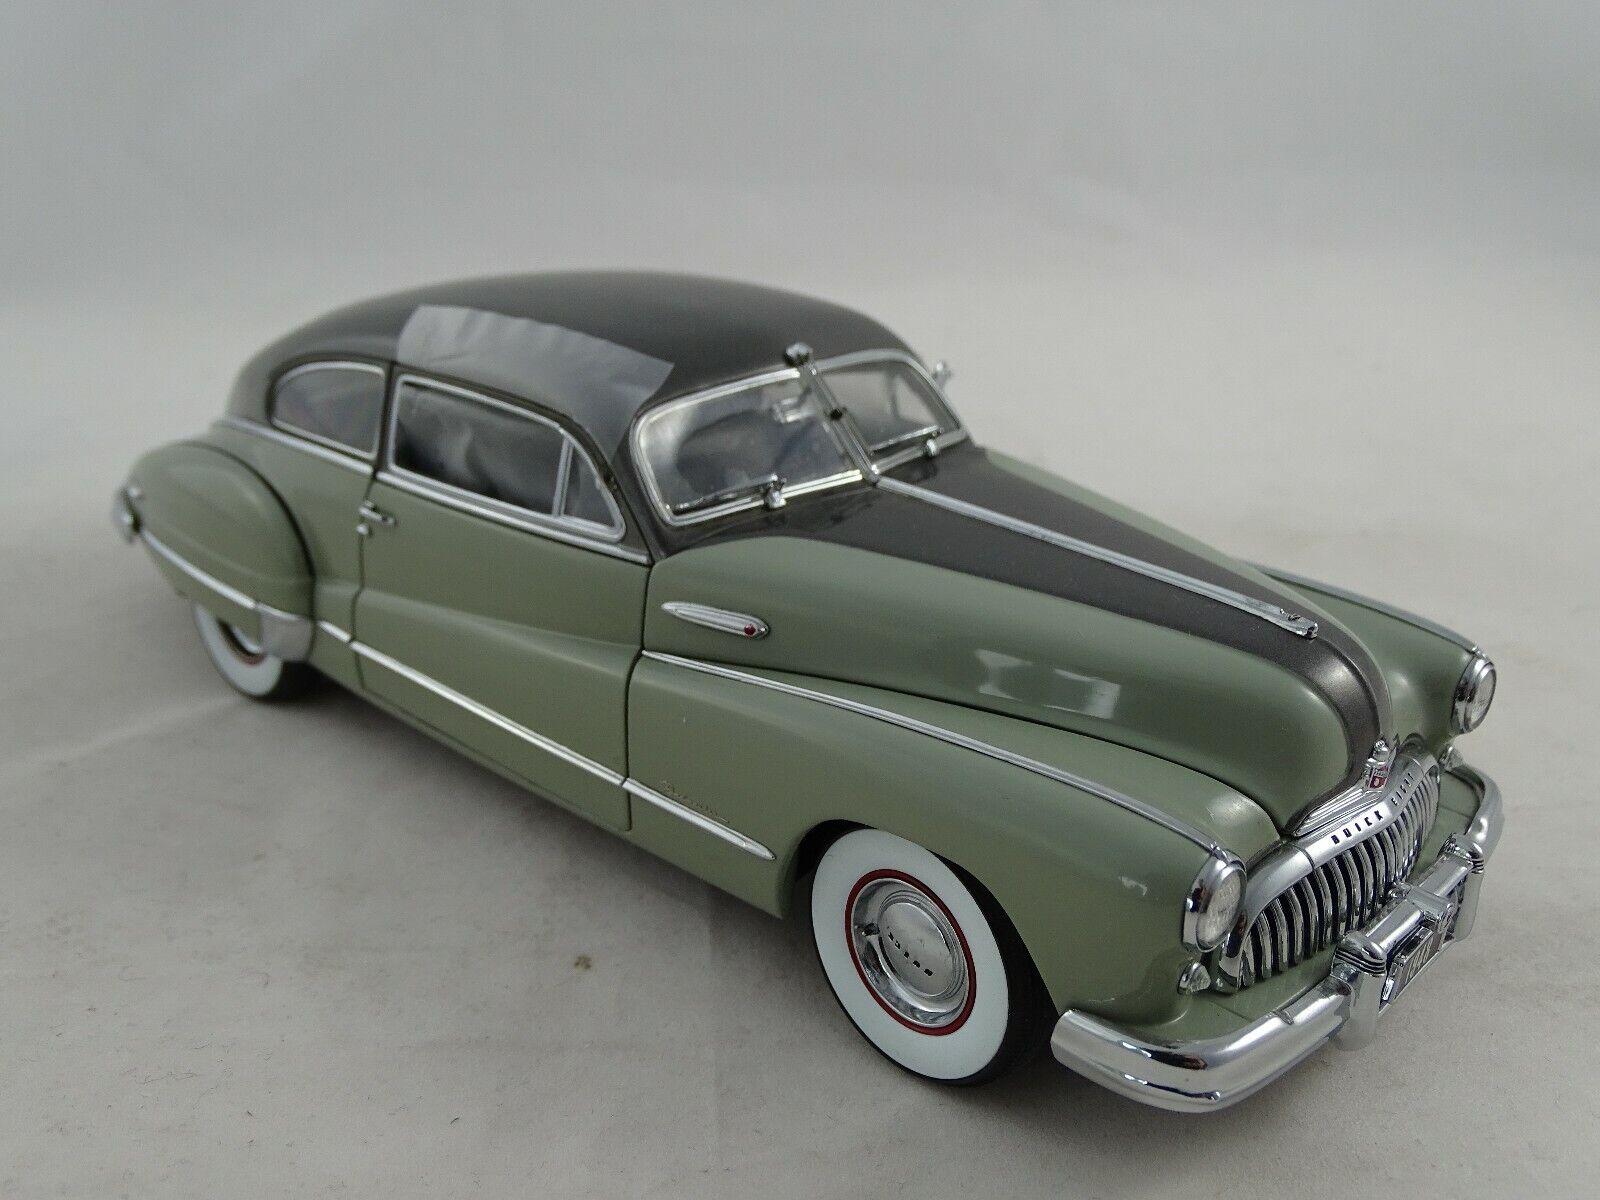 1 24 Danbury Mint 1948 Buick Roadmaster Coupé Rareza en Emb.orig.